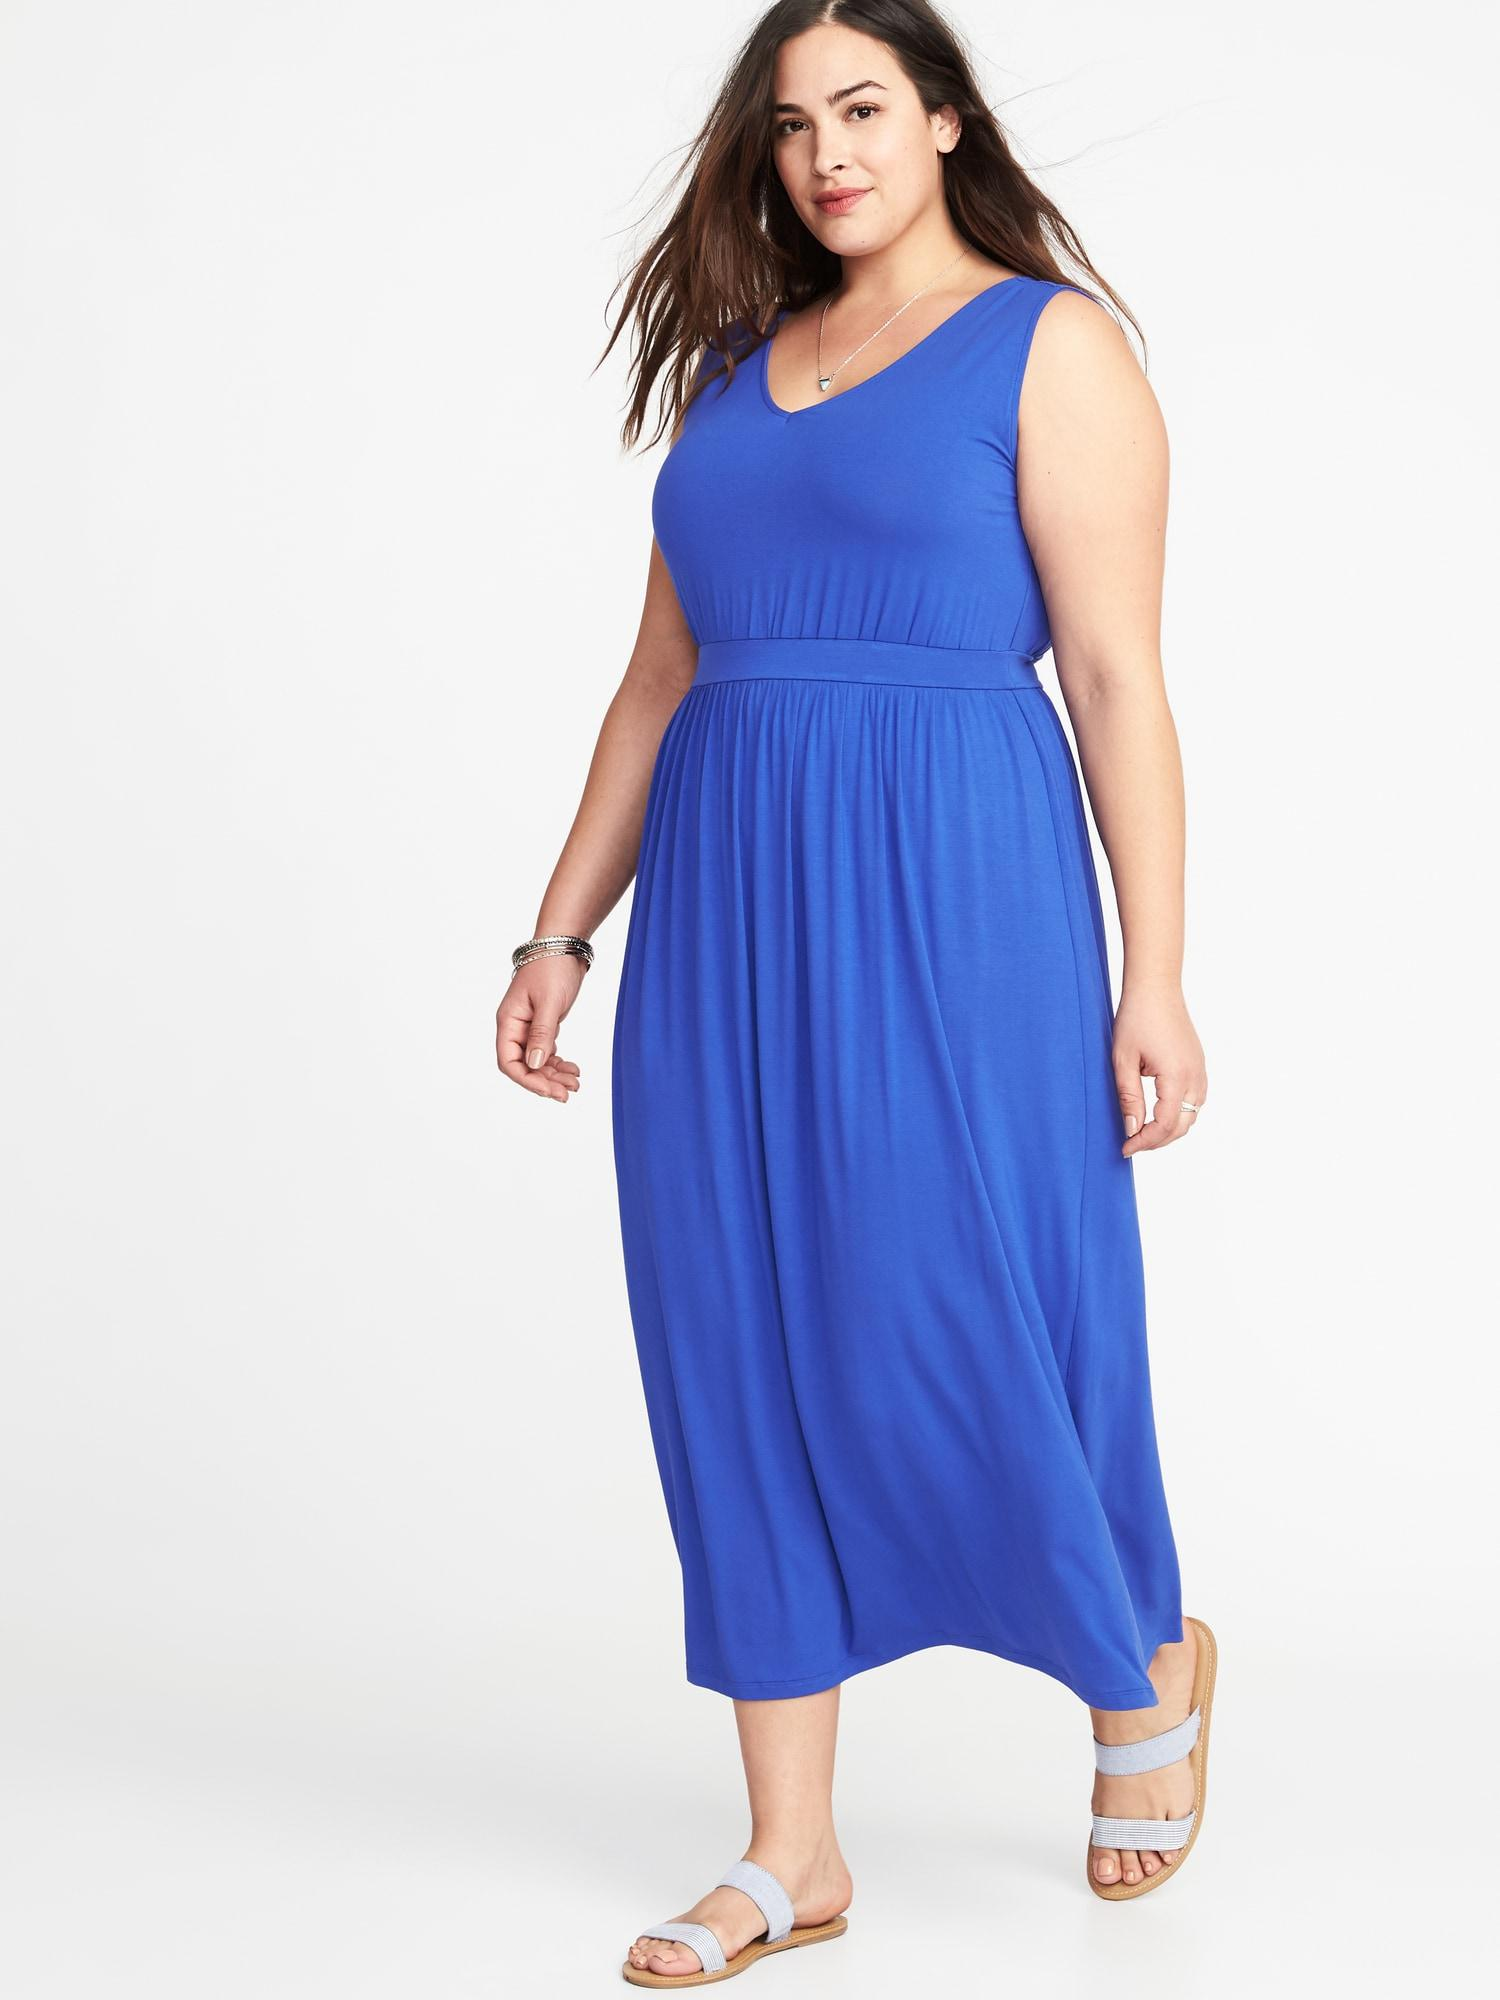 Old Navy Blue Empire-waist Plus-size V-neck Maxi Dress